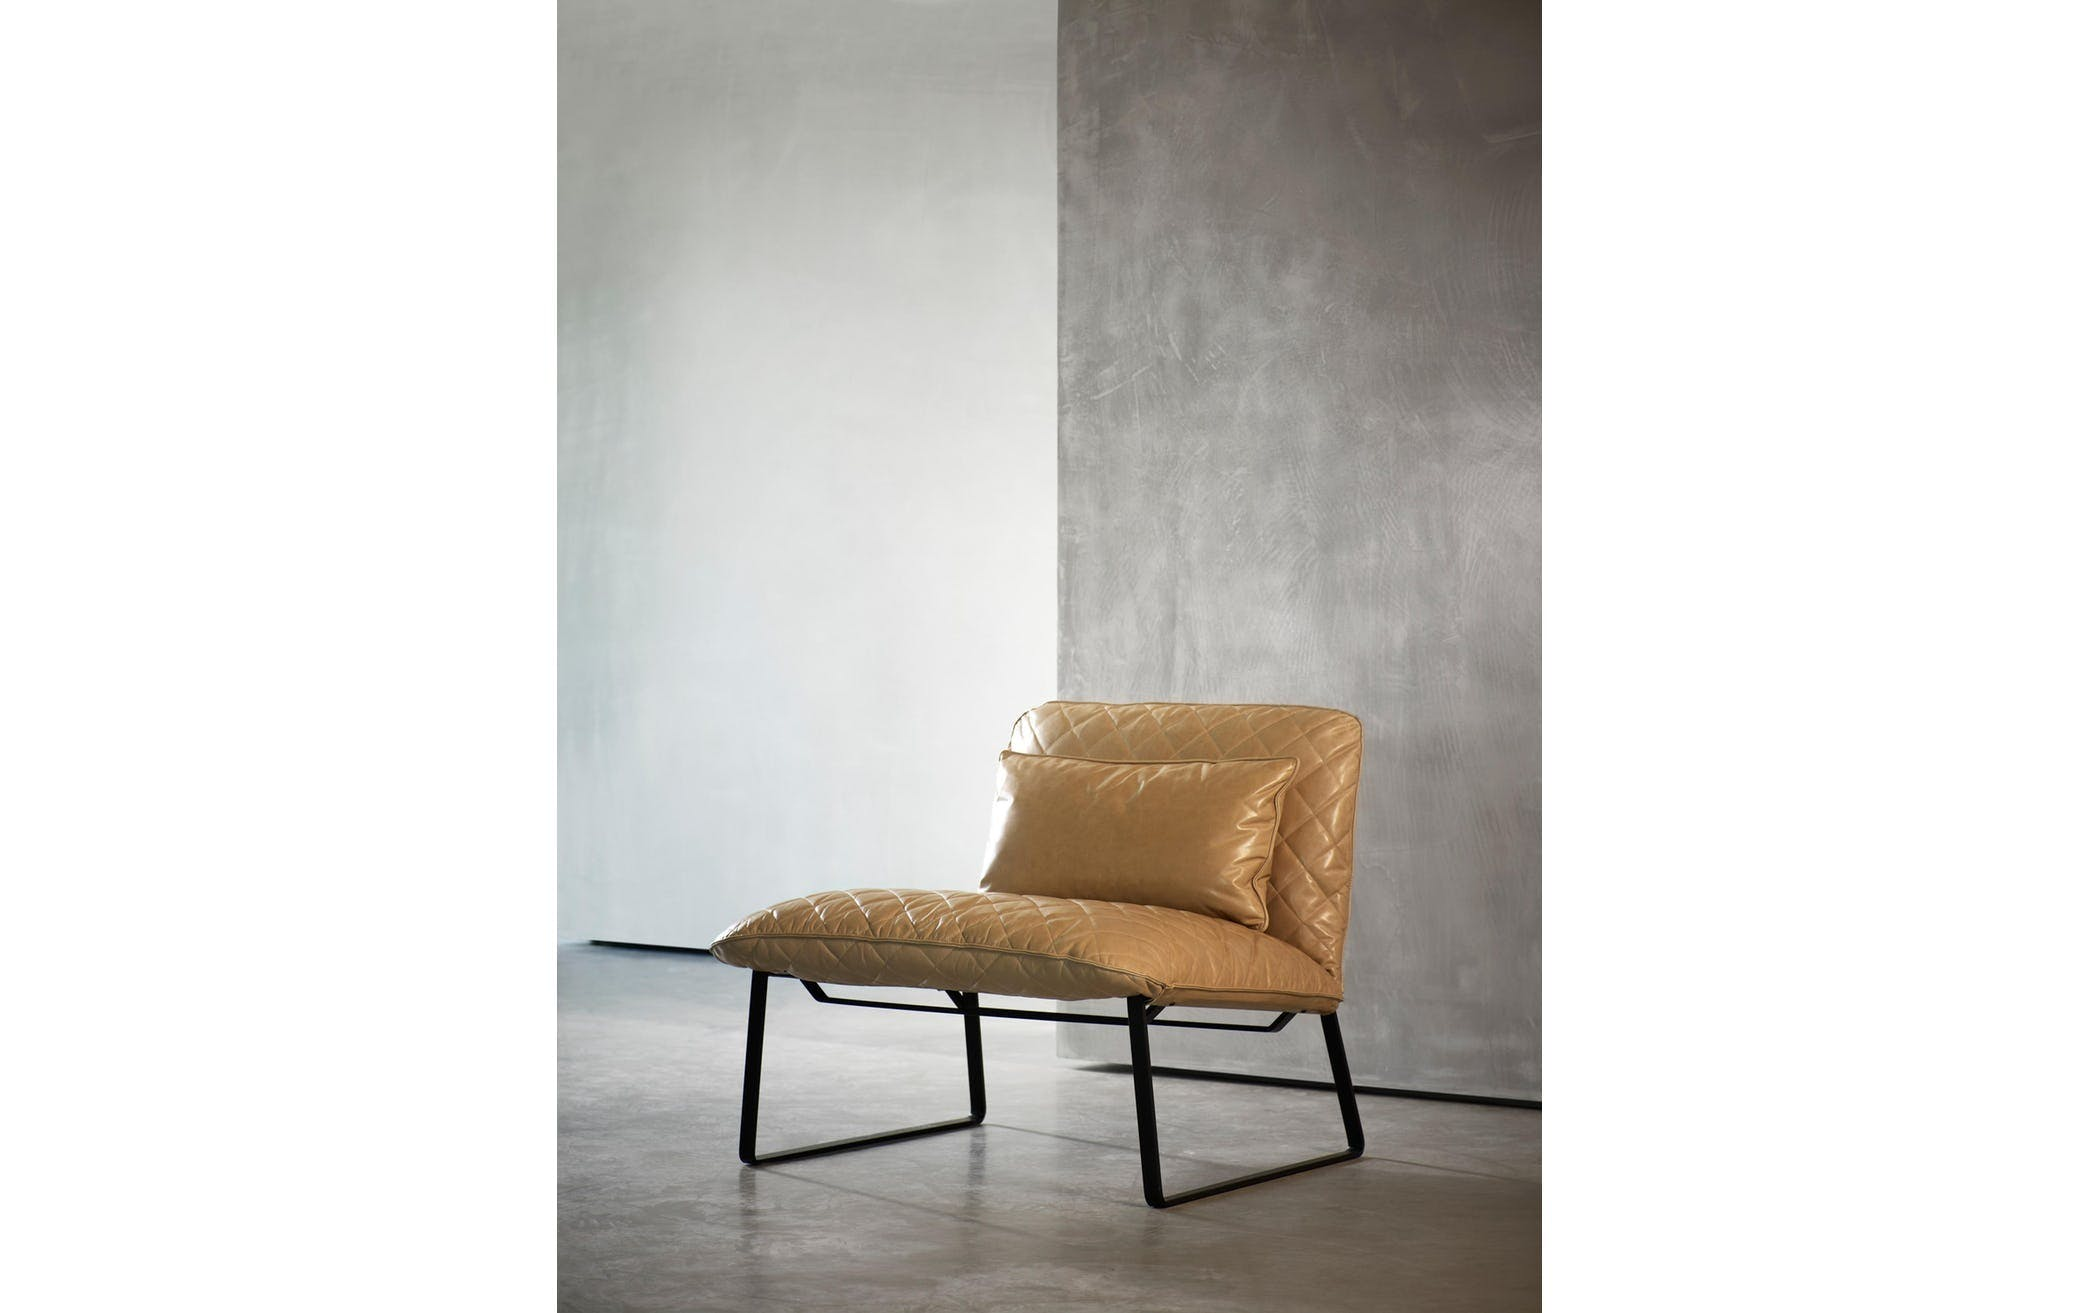 Kekke Lounge Chair 1